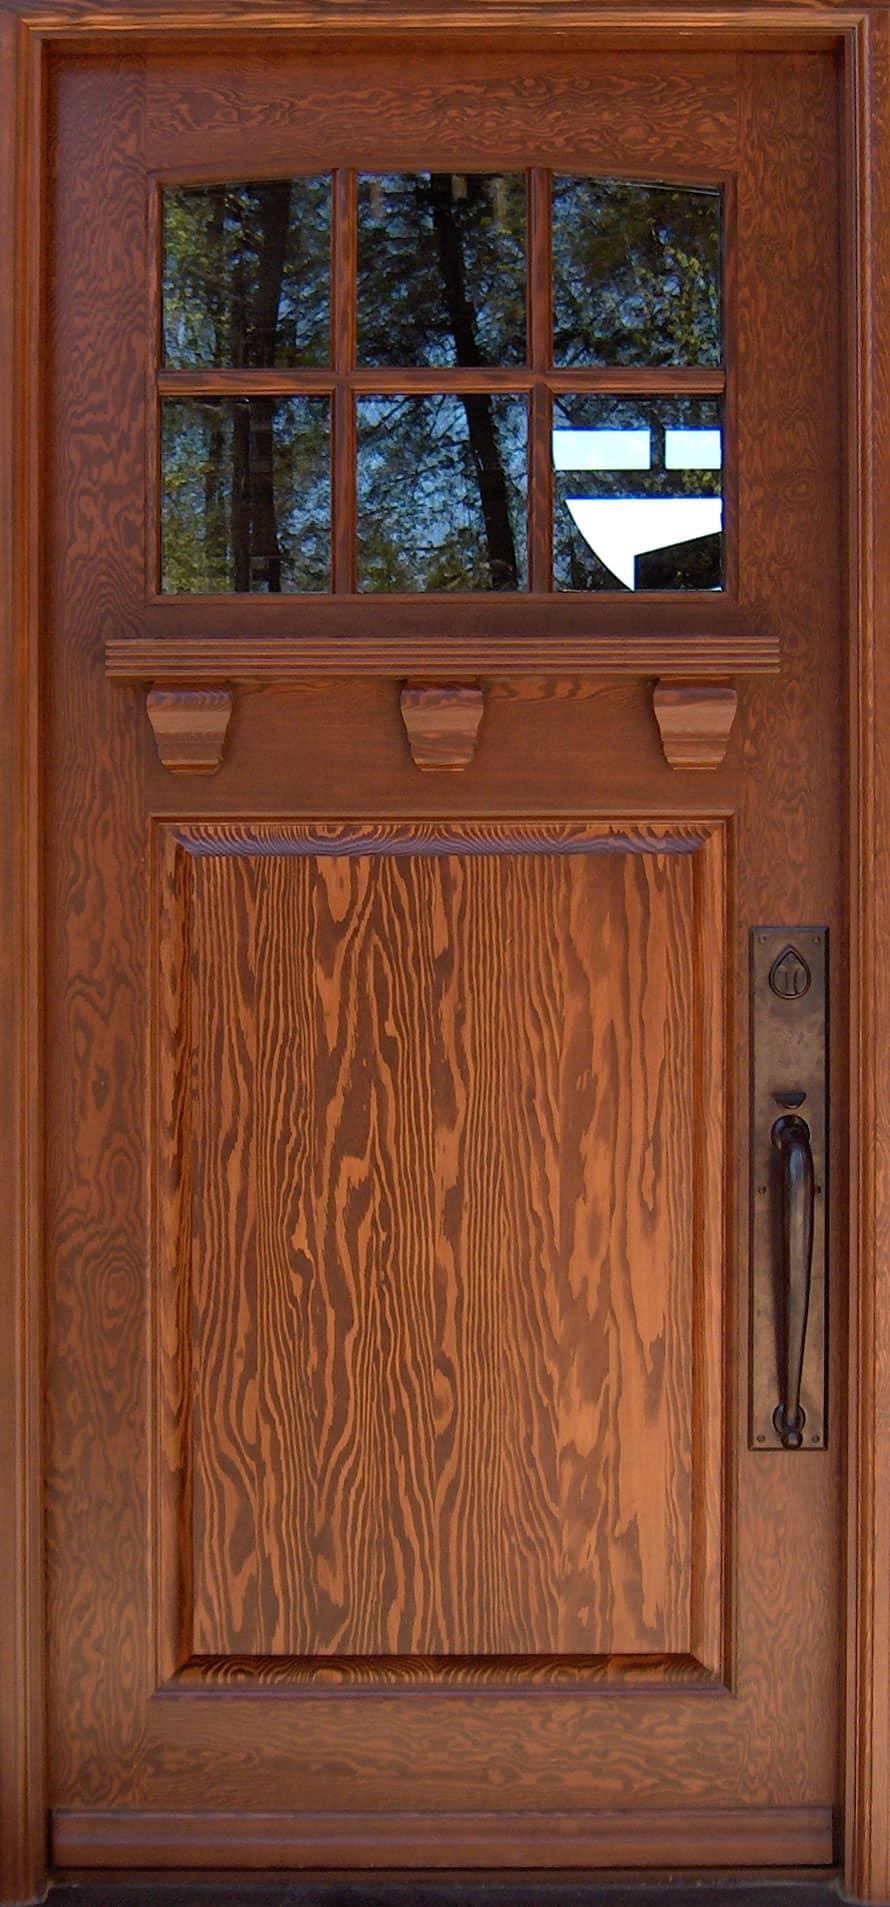 kerala wood price models nature doors solid product buy designs detail house door modern teak main